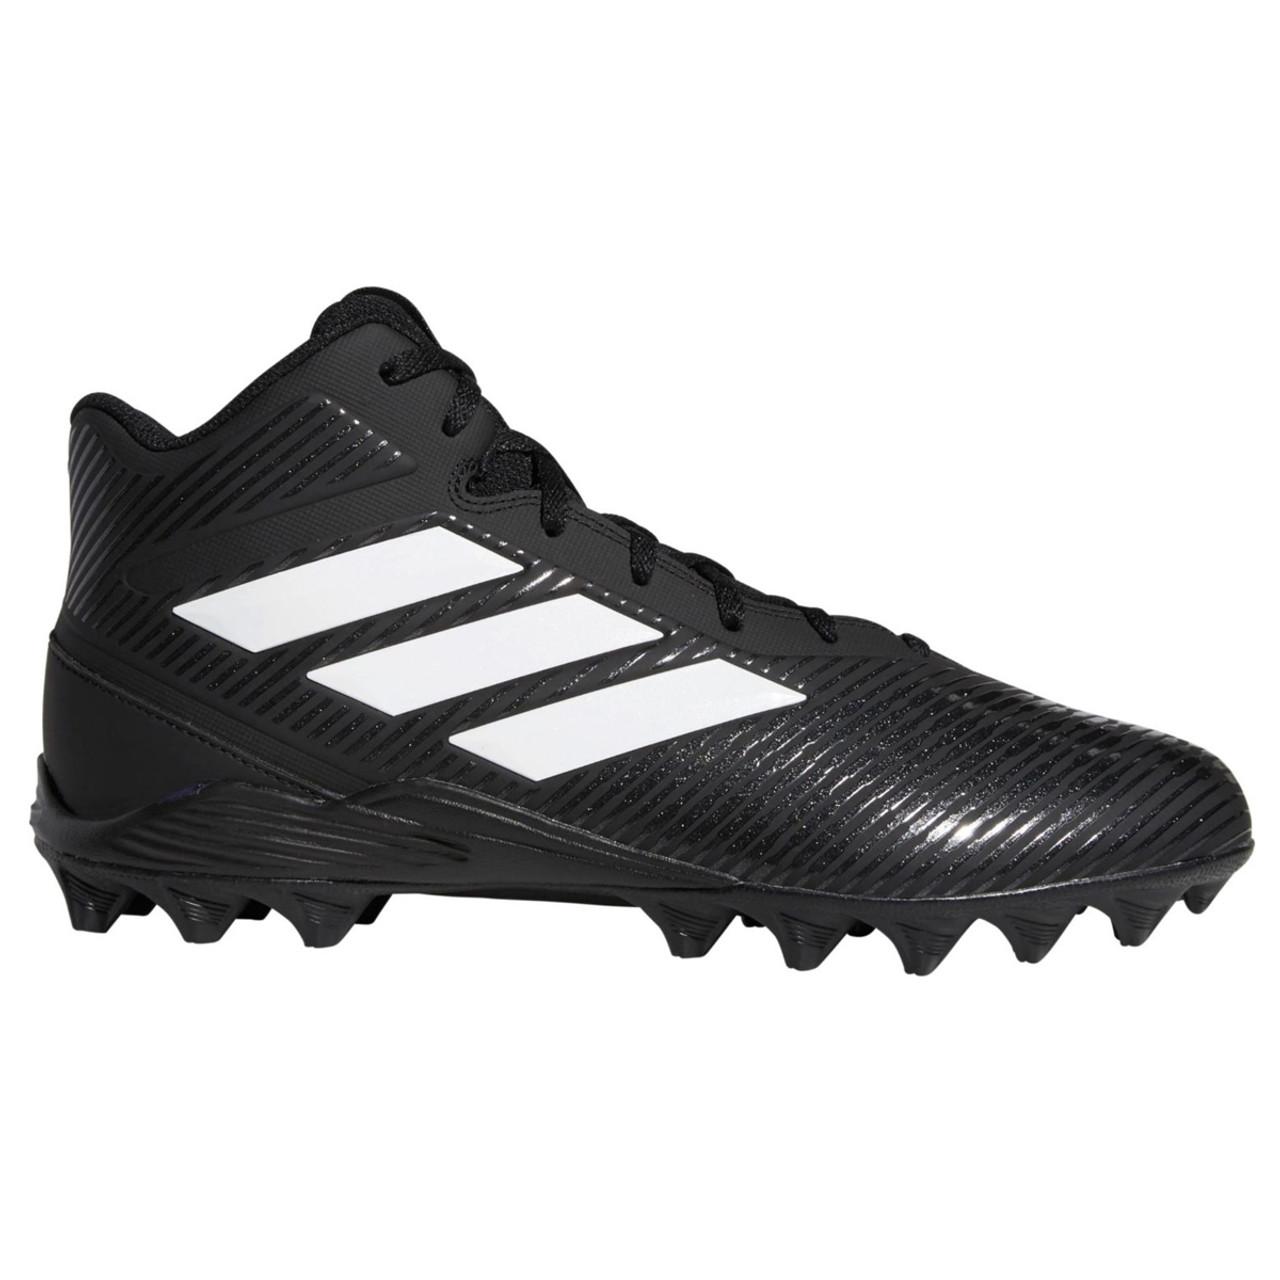 Adidas Freak Mid MD Men's Football